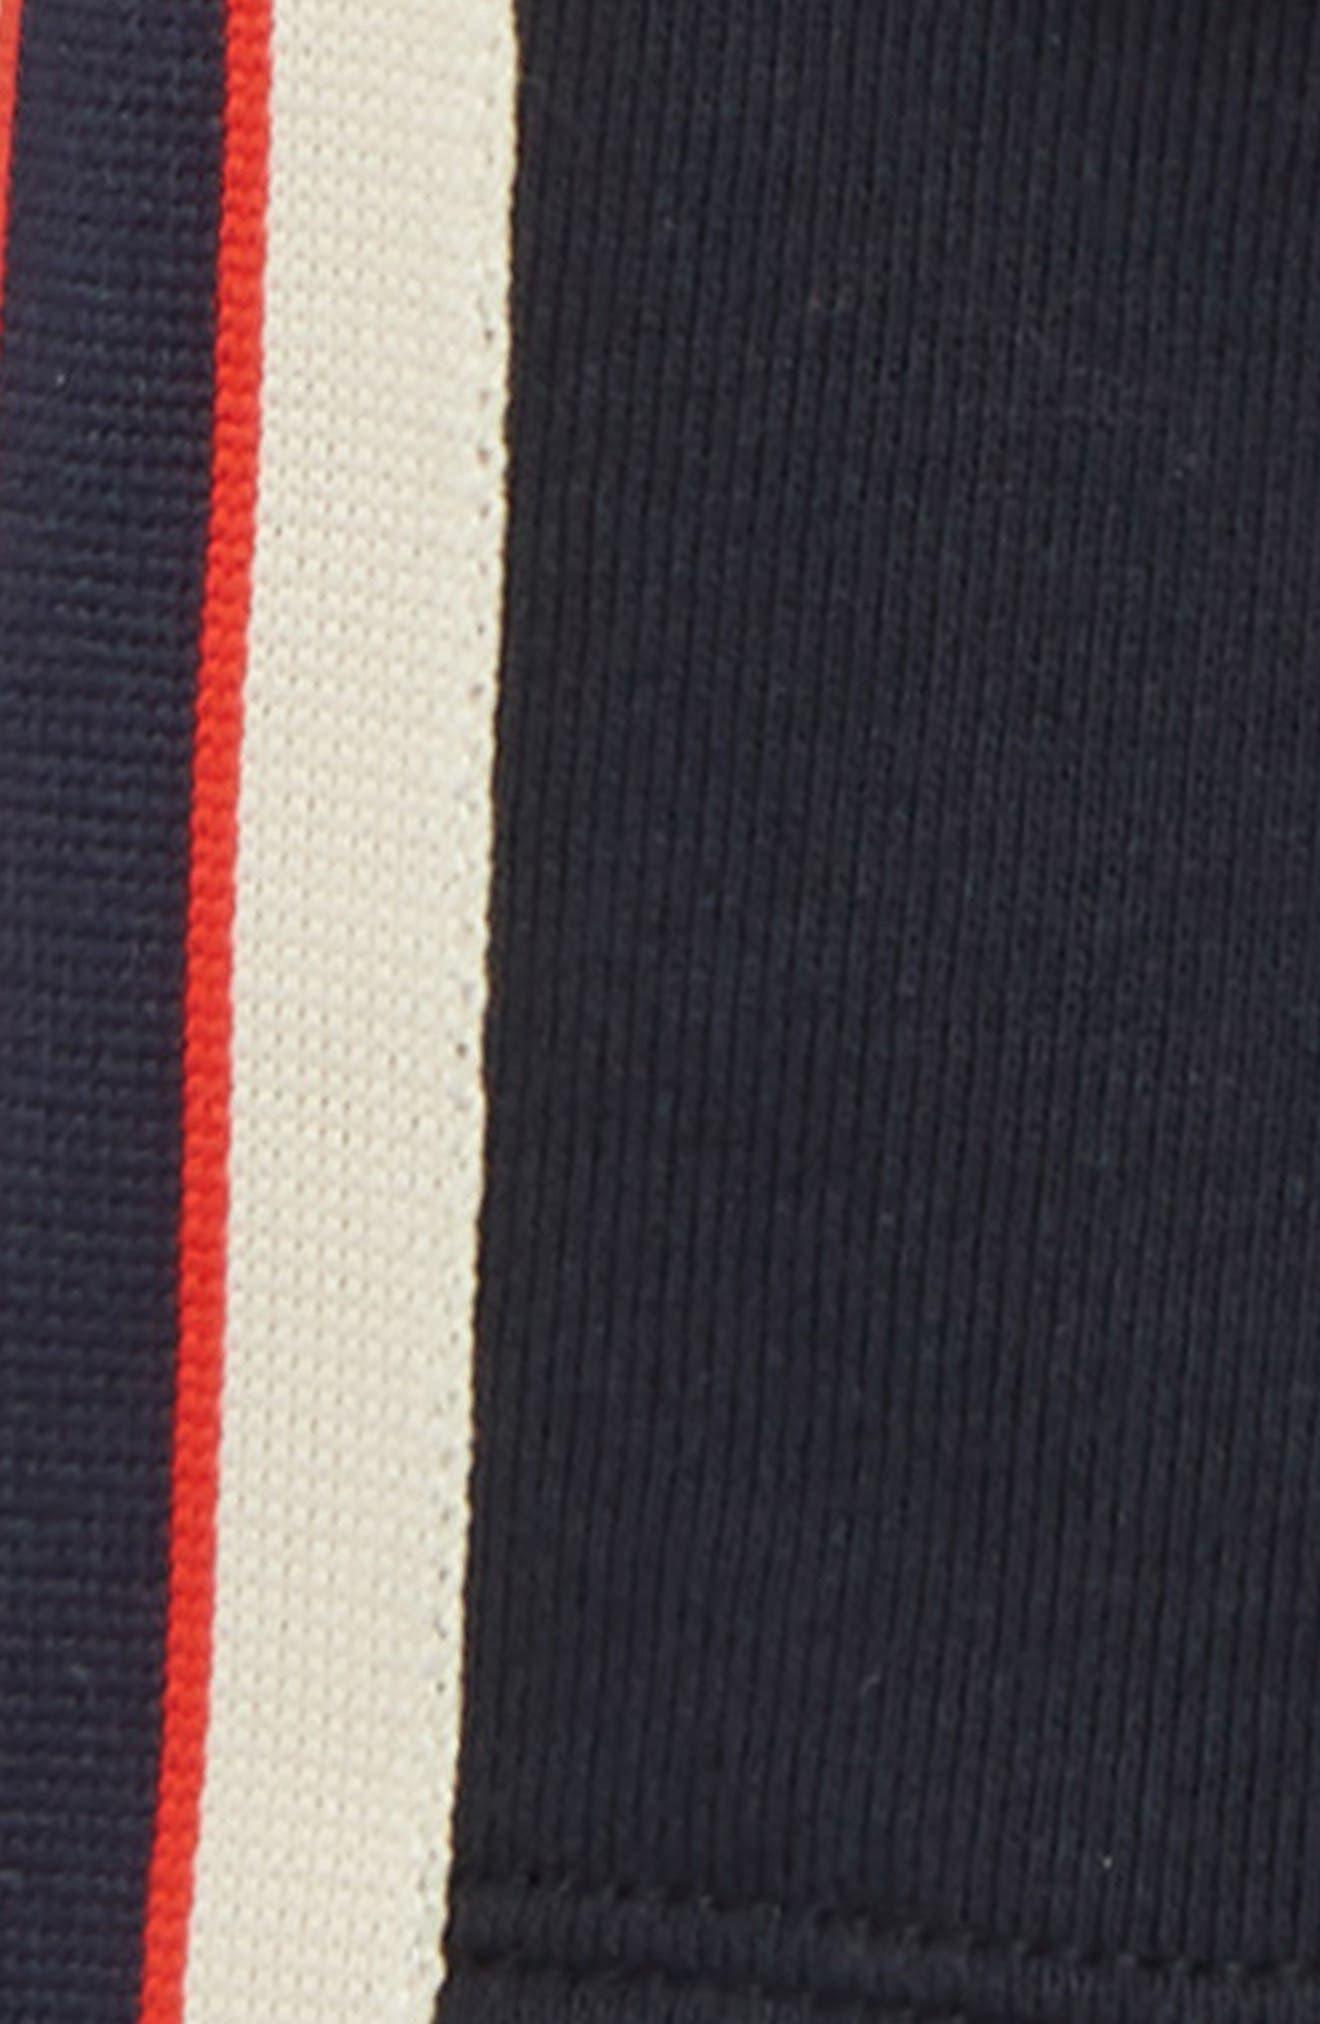 GUCCI, Logo Stripe Jogging Shorts, Alternate thumbnail 2, color, DAMASK